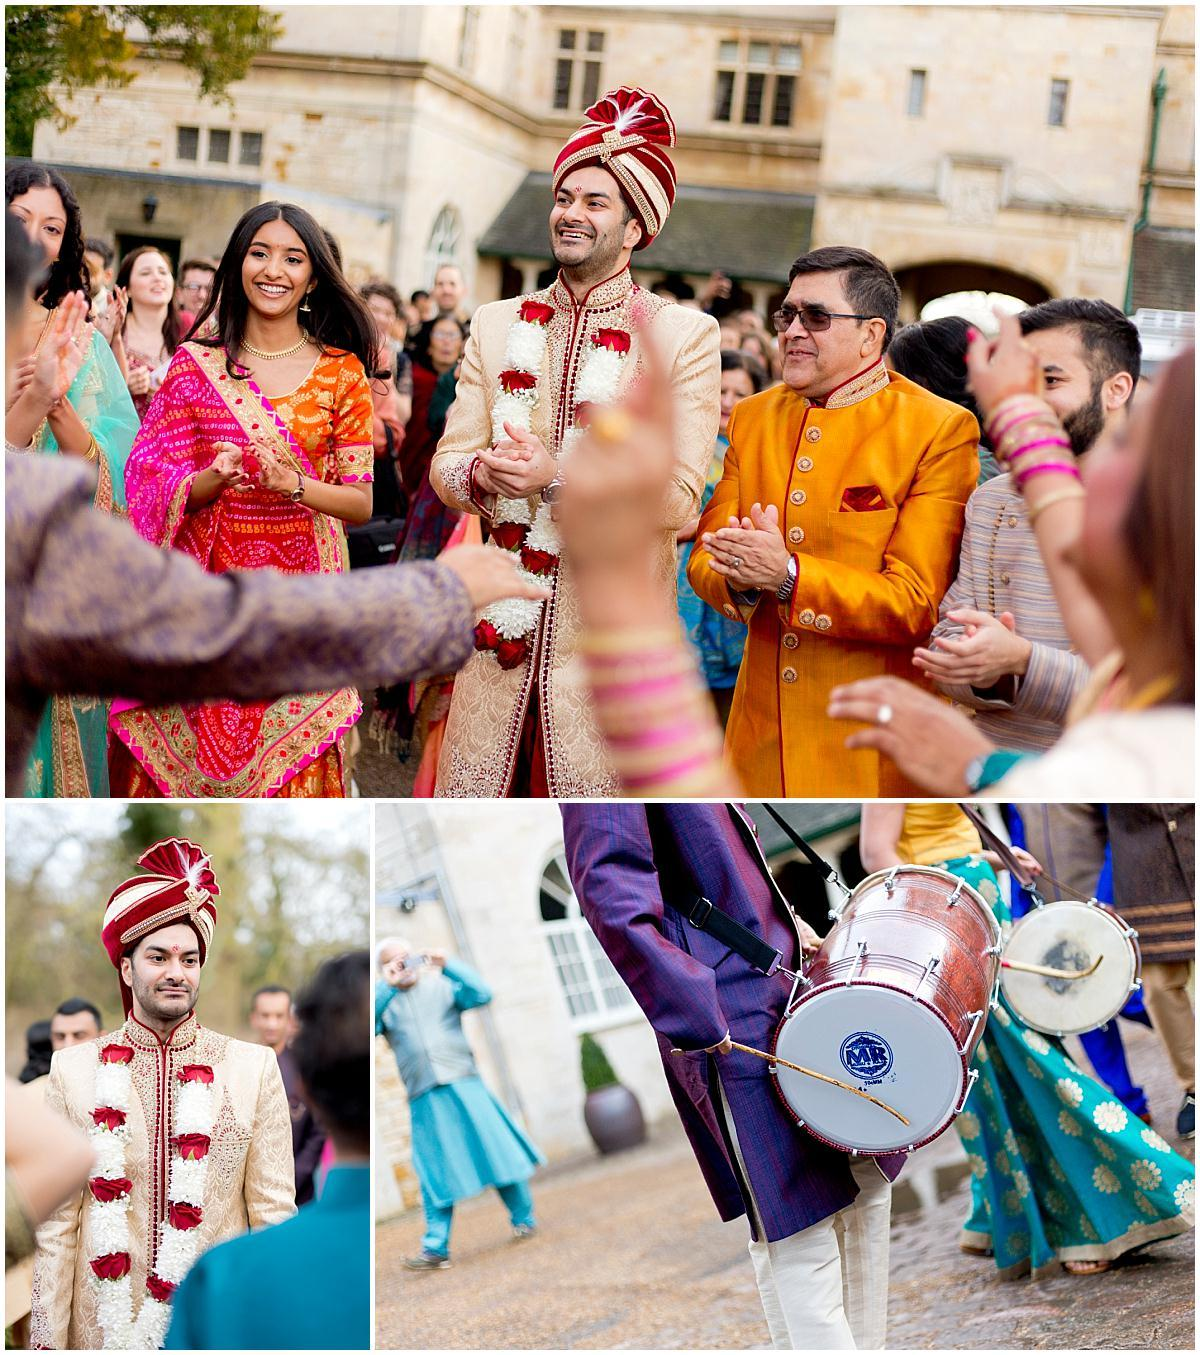 Hindu wedding celebrations